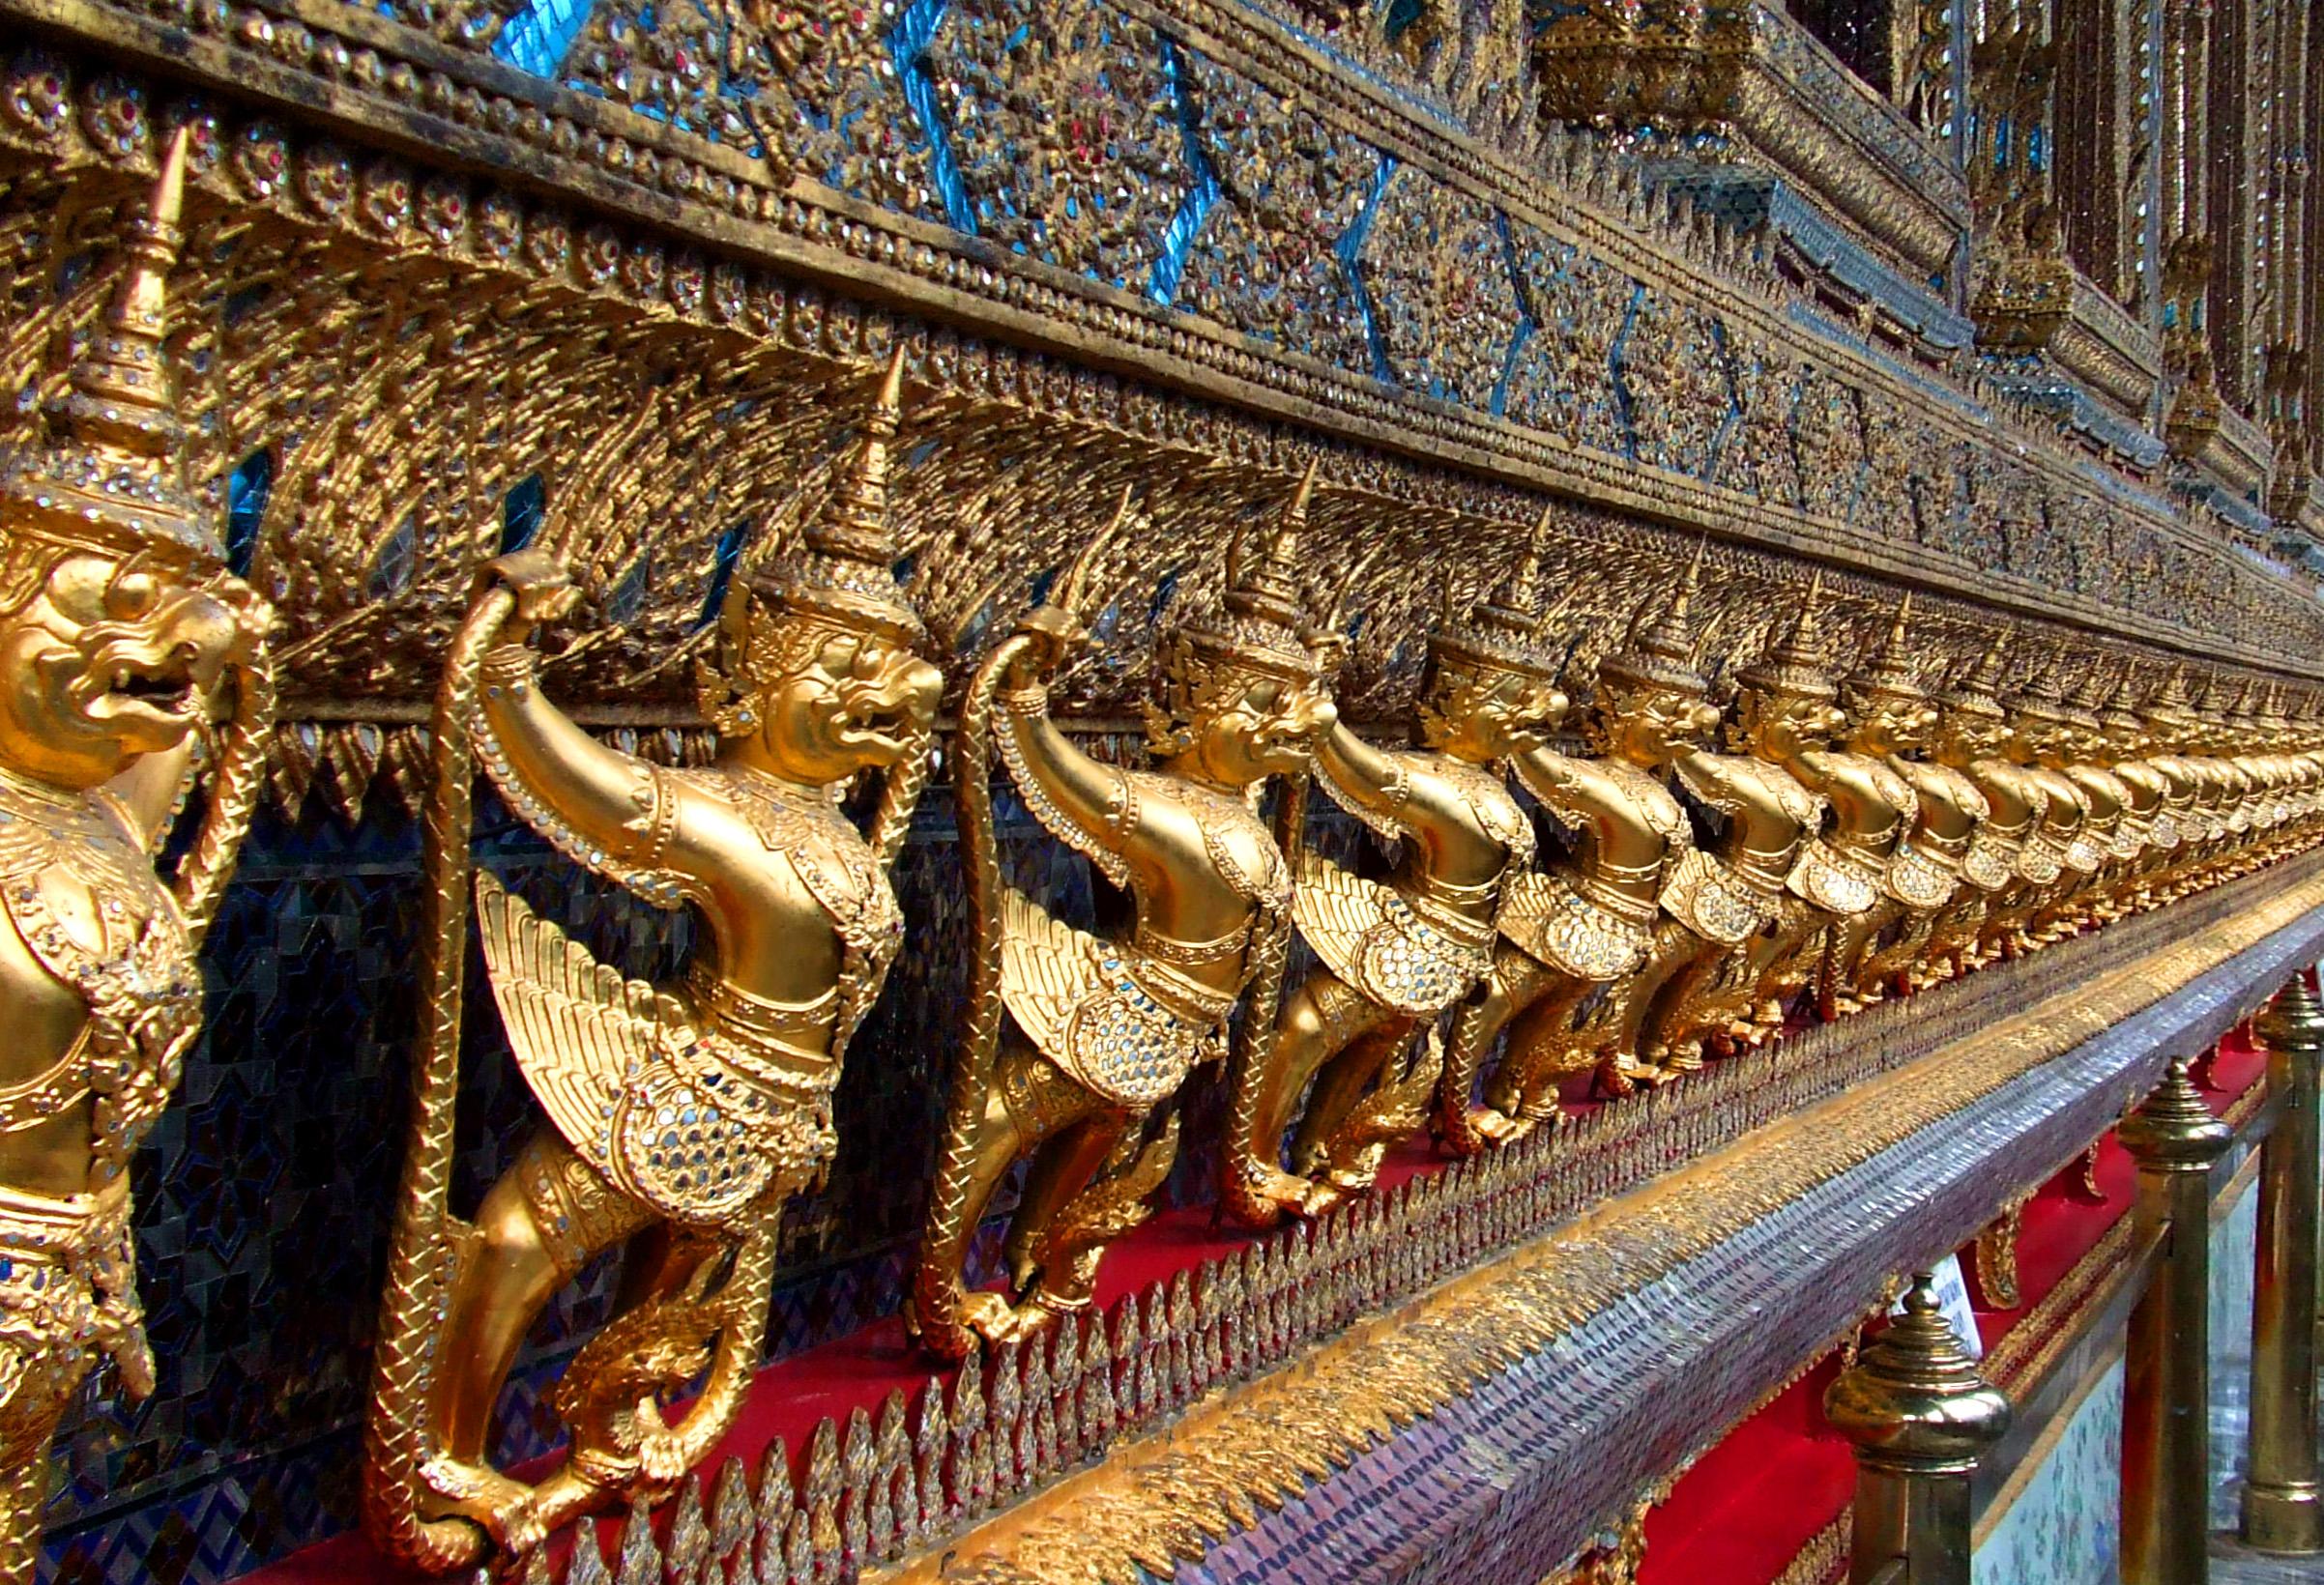 Golden Garuda at Wat Phra Kaew, Religion, Religious, Sculpture, Palace, HQ Photo